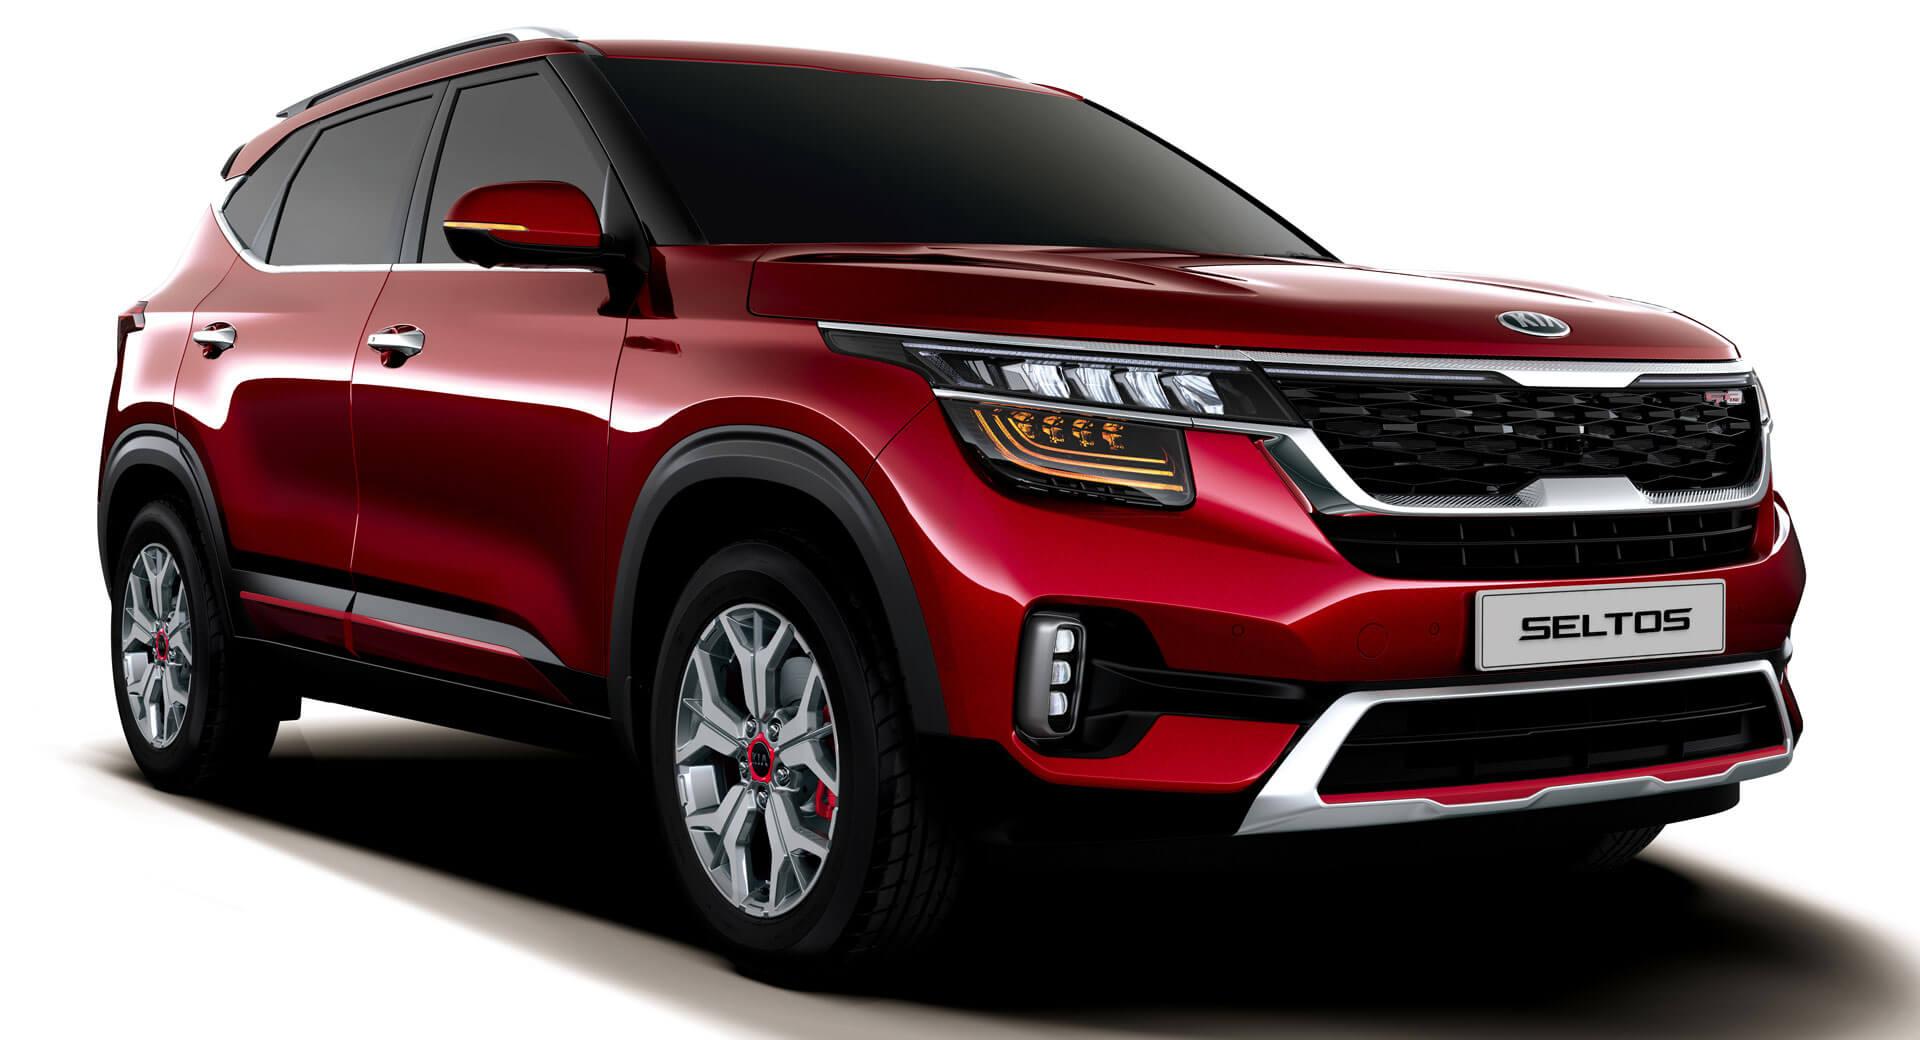 2020 Kia Seltos Unveiled As The Company's New Small SUV